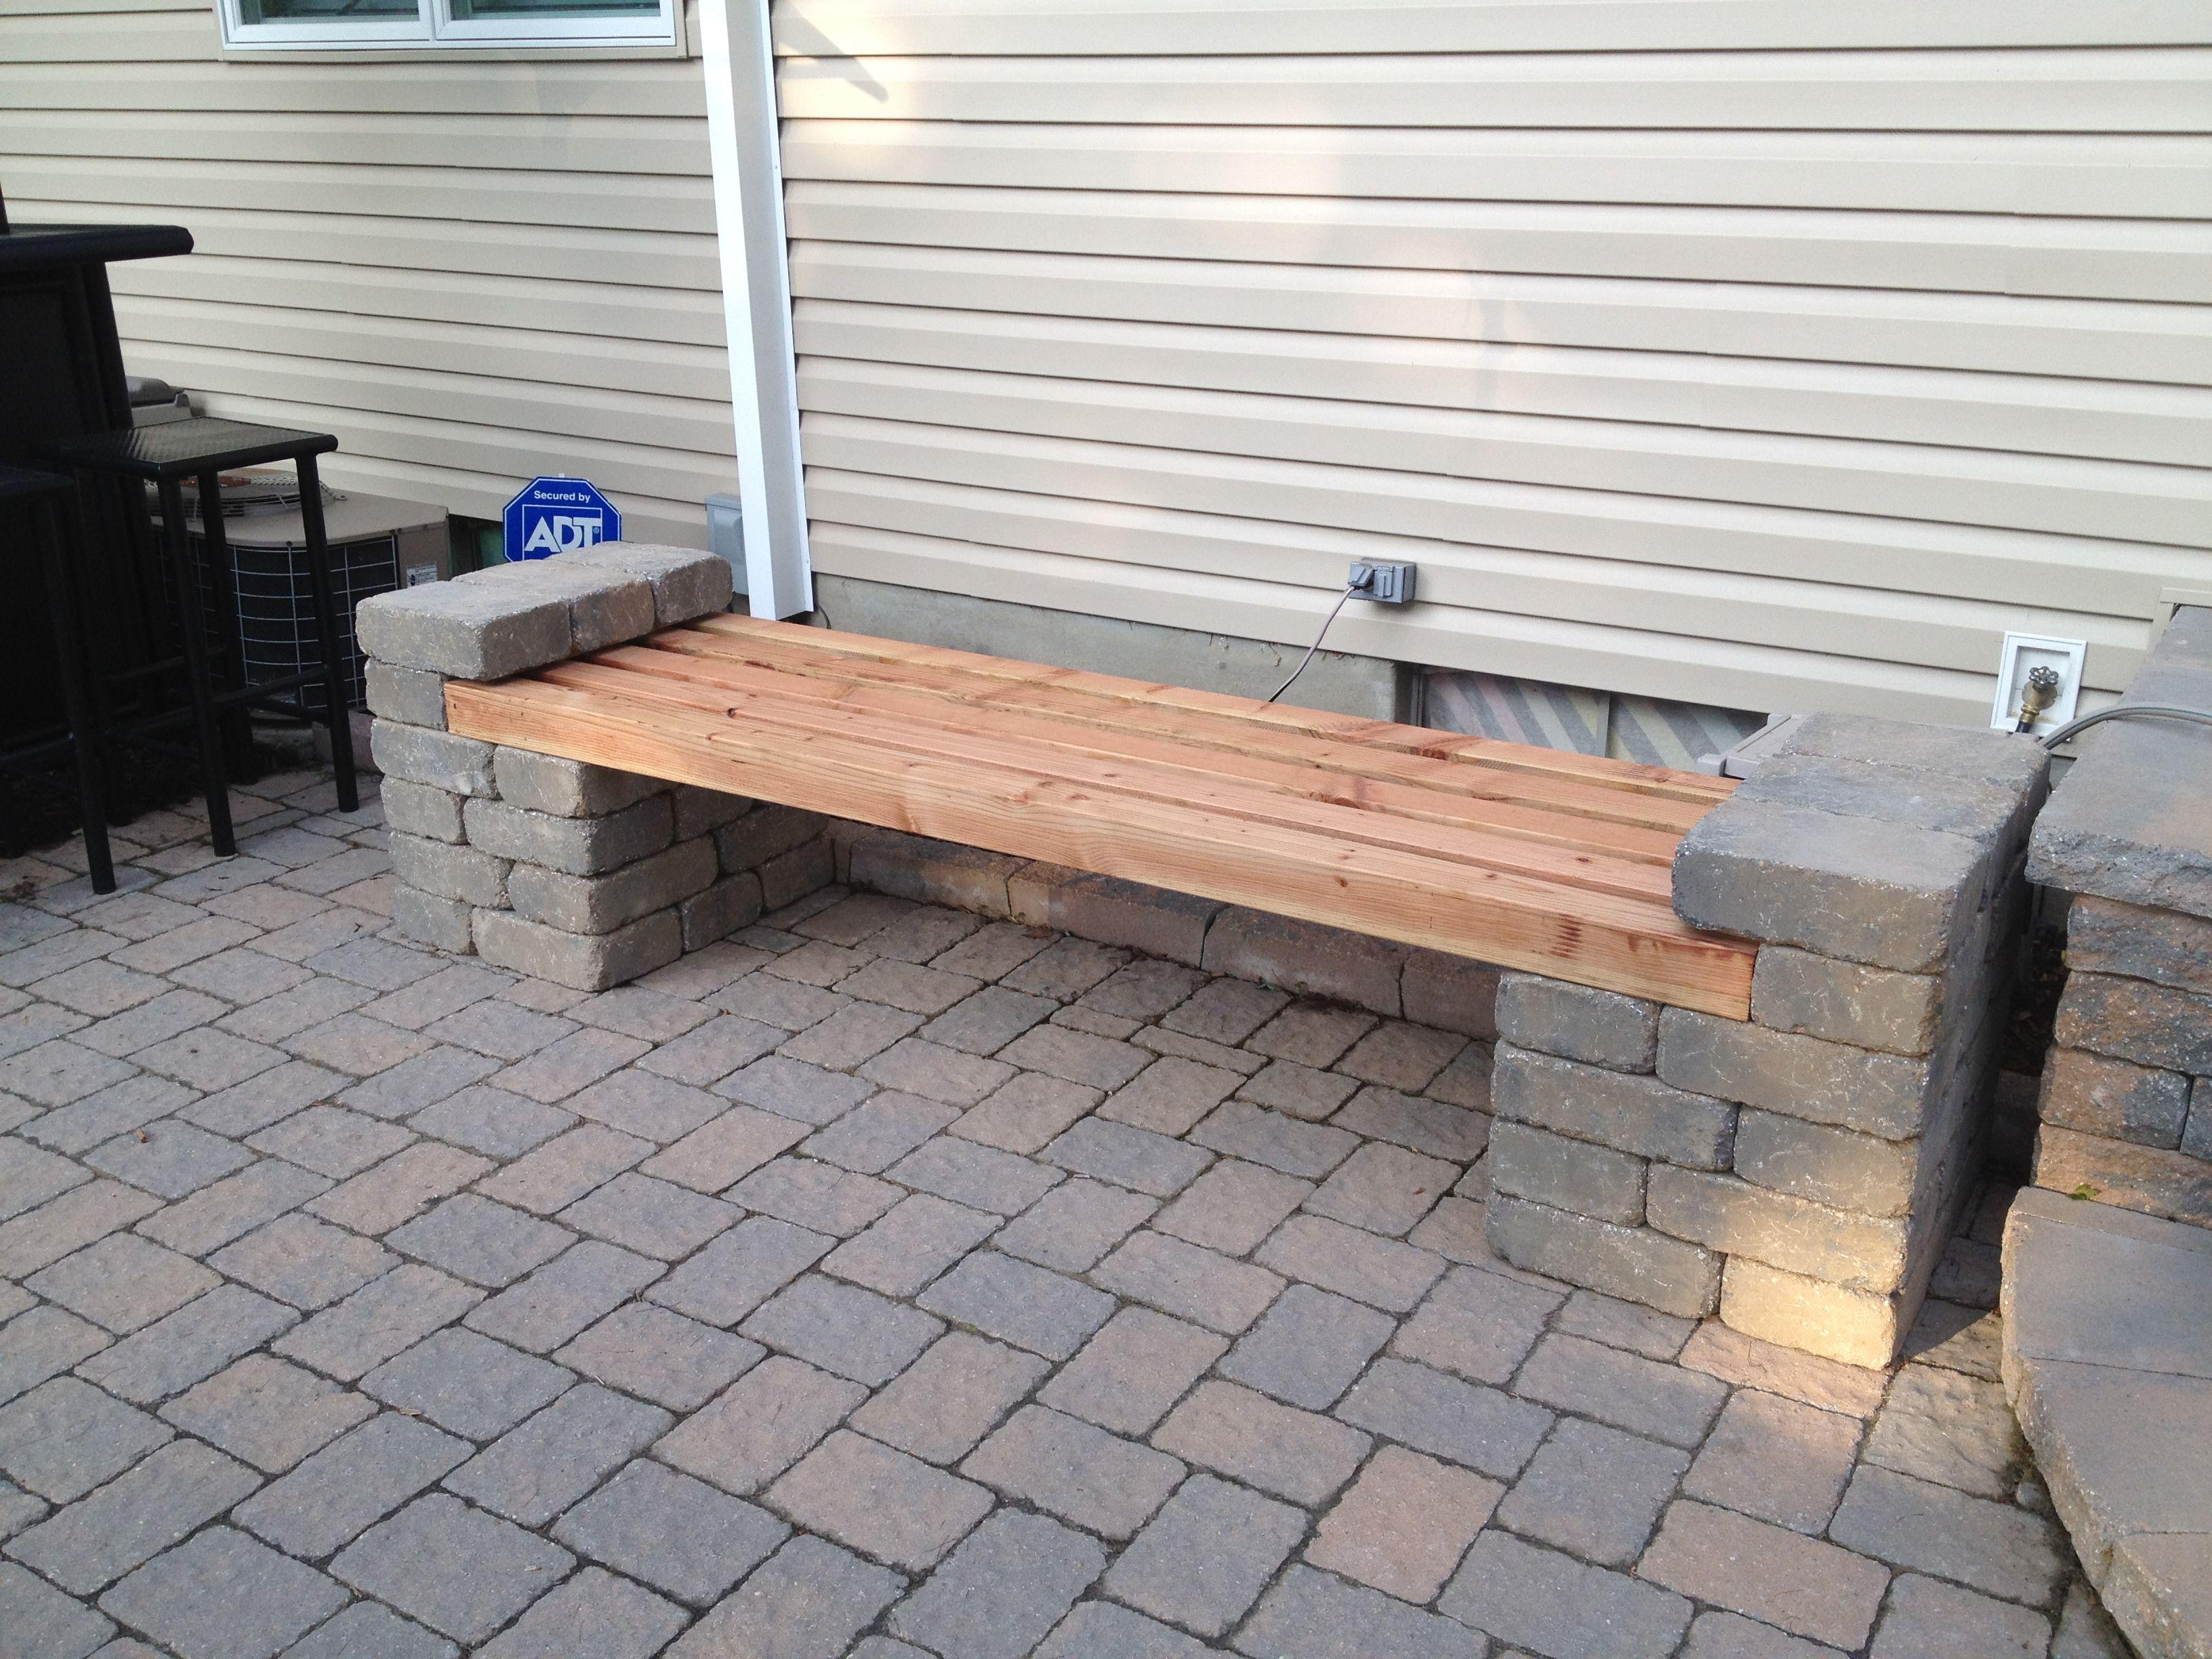 Patio Block And Wood Bench Design In 2019 Blocks